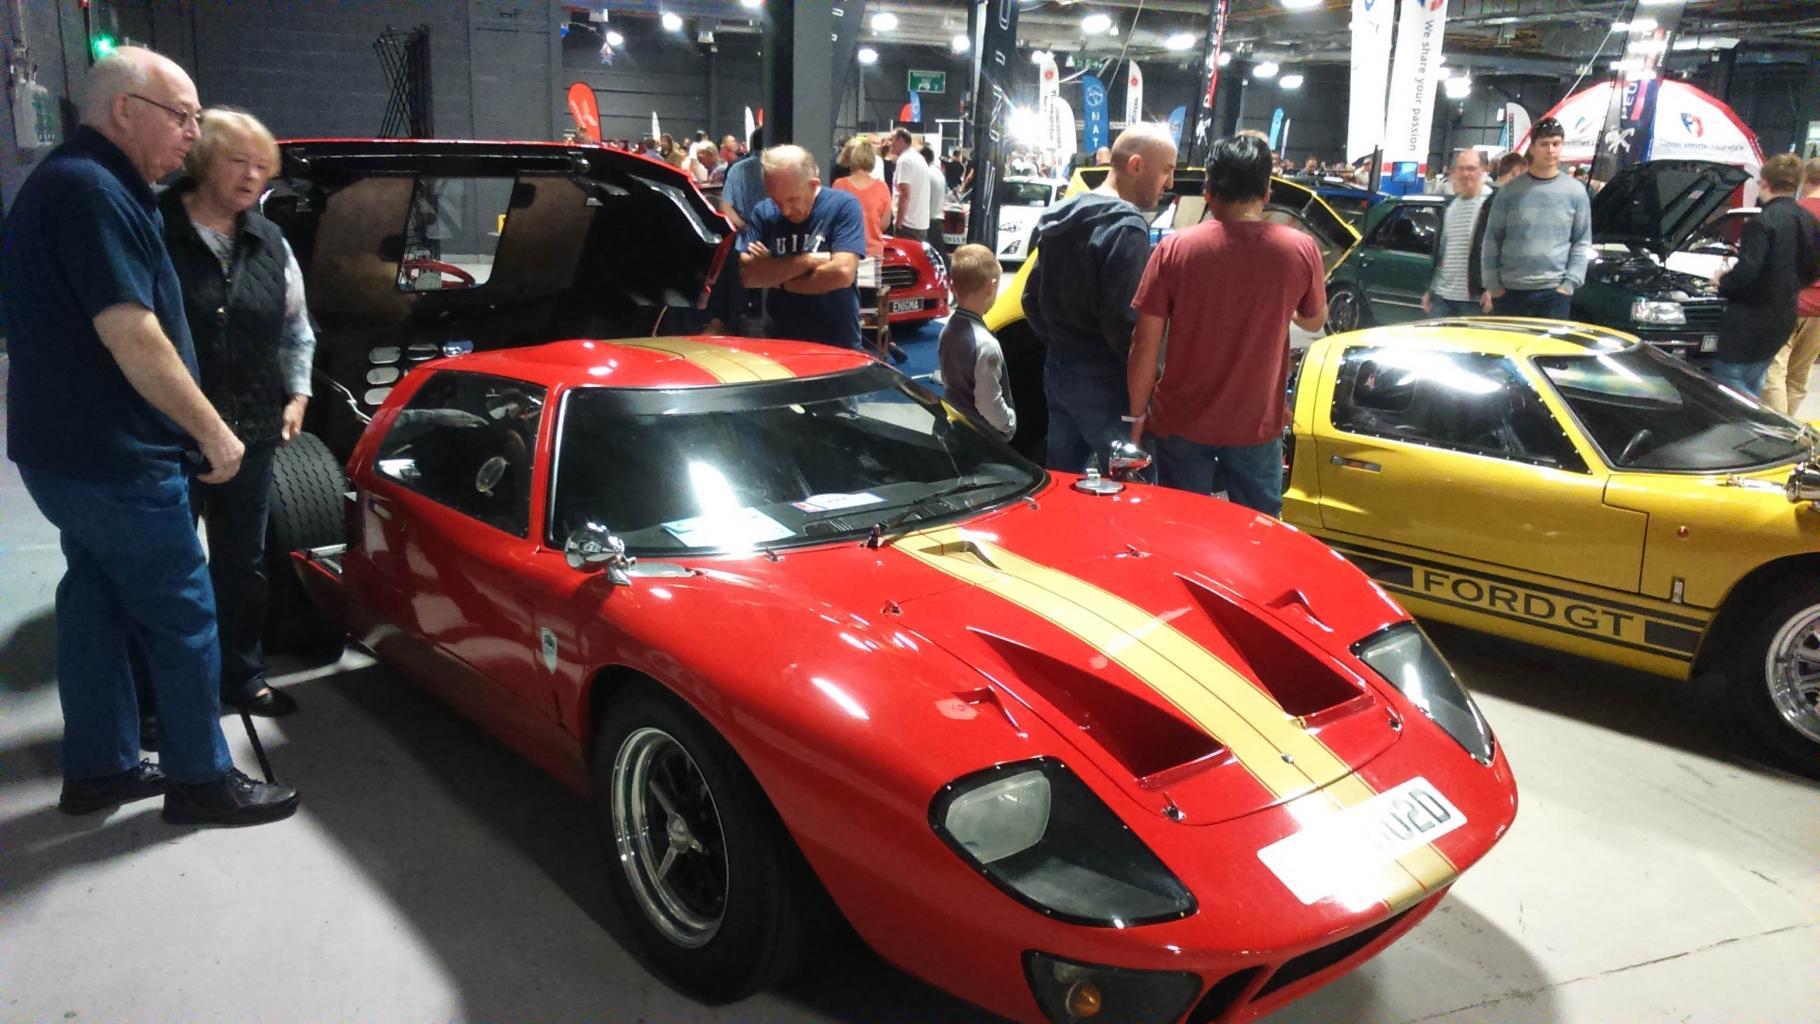 Manchester Classic Car Show 2016-mcr-classic-show-2-jpg